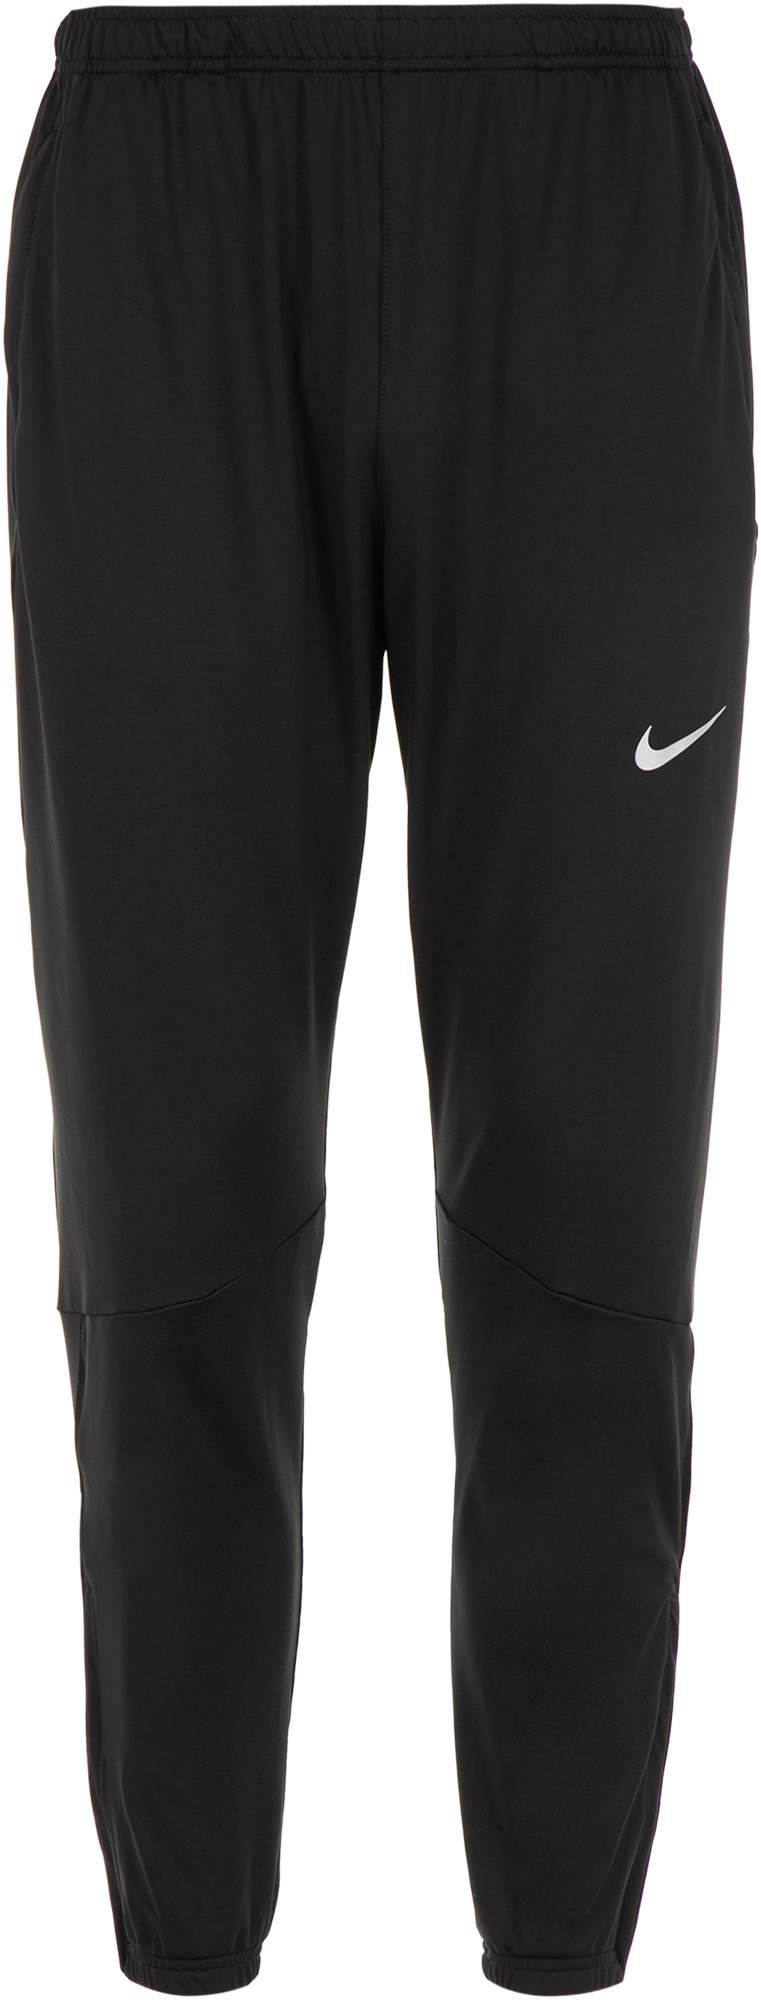 Nike Брюки мужские Nike Phenom, размер 54-56 цена